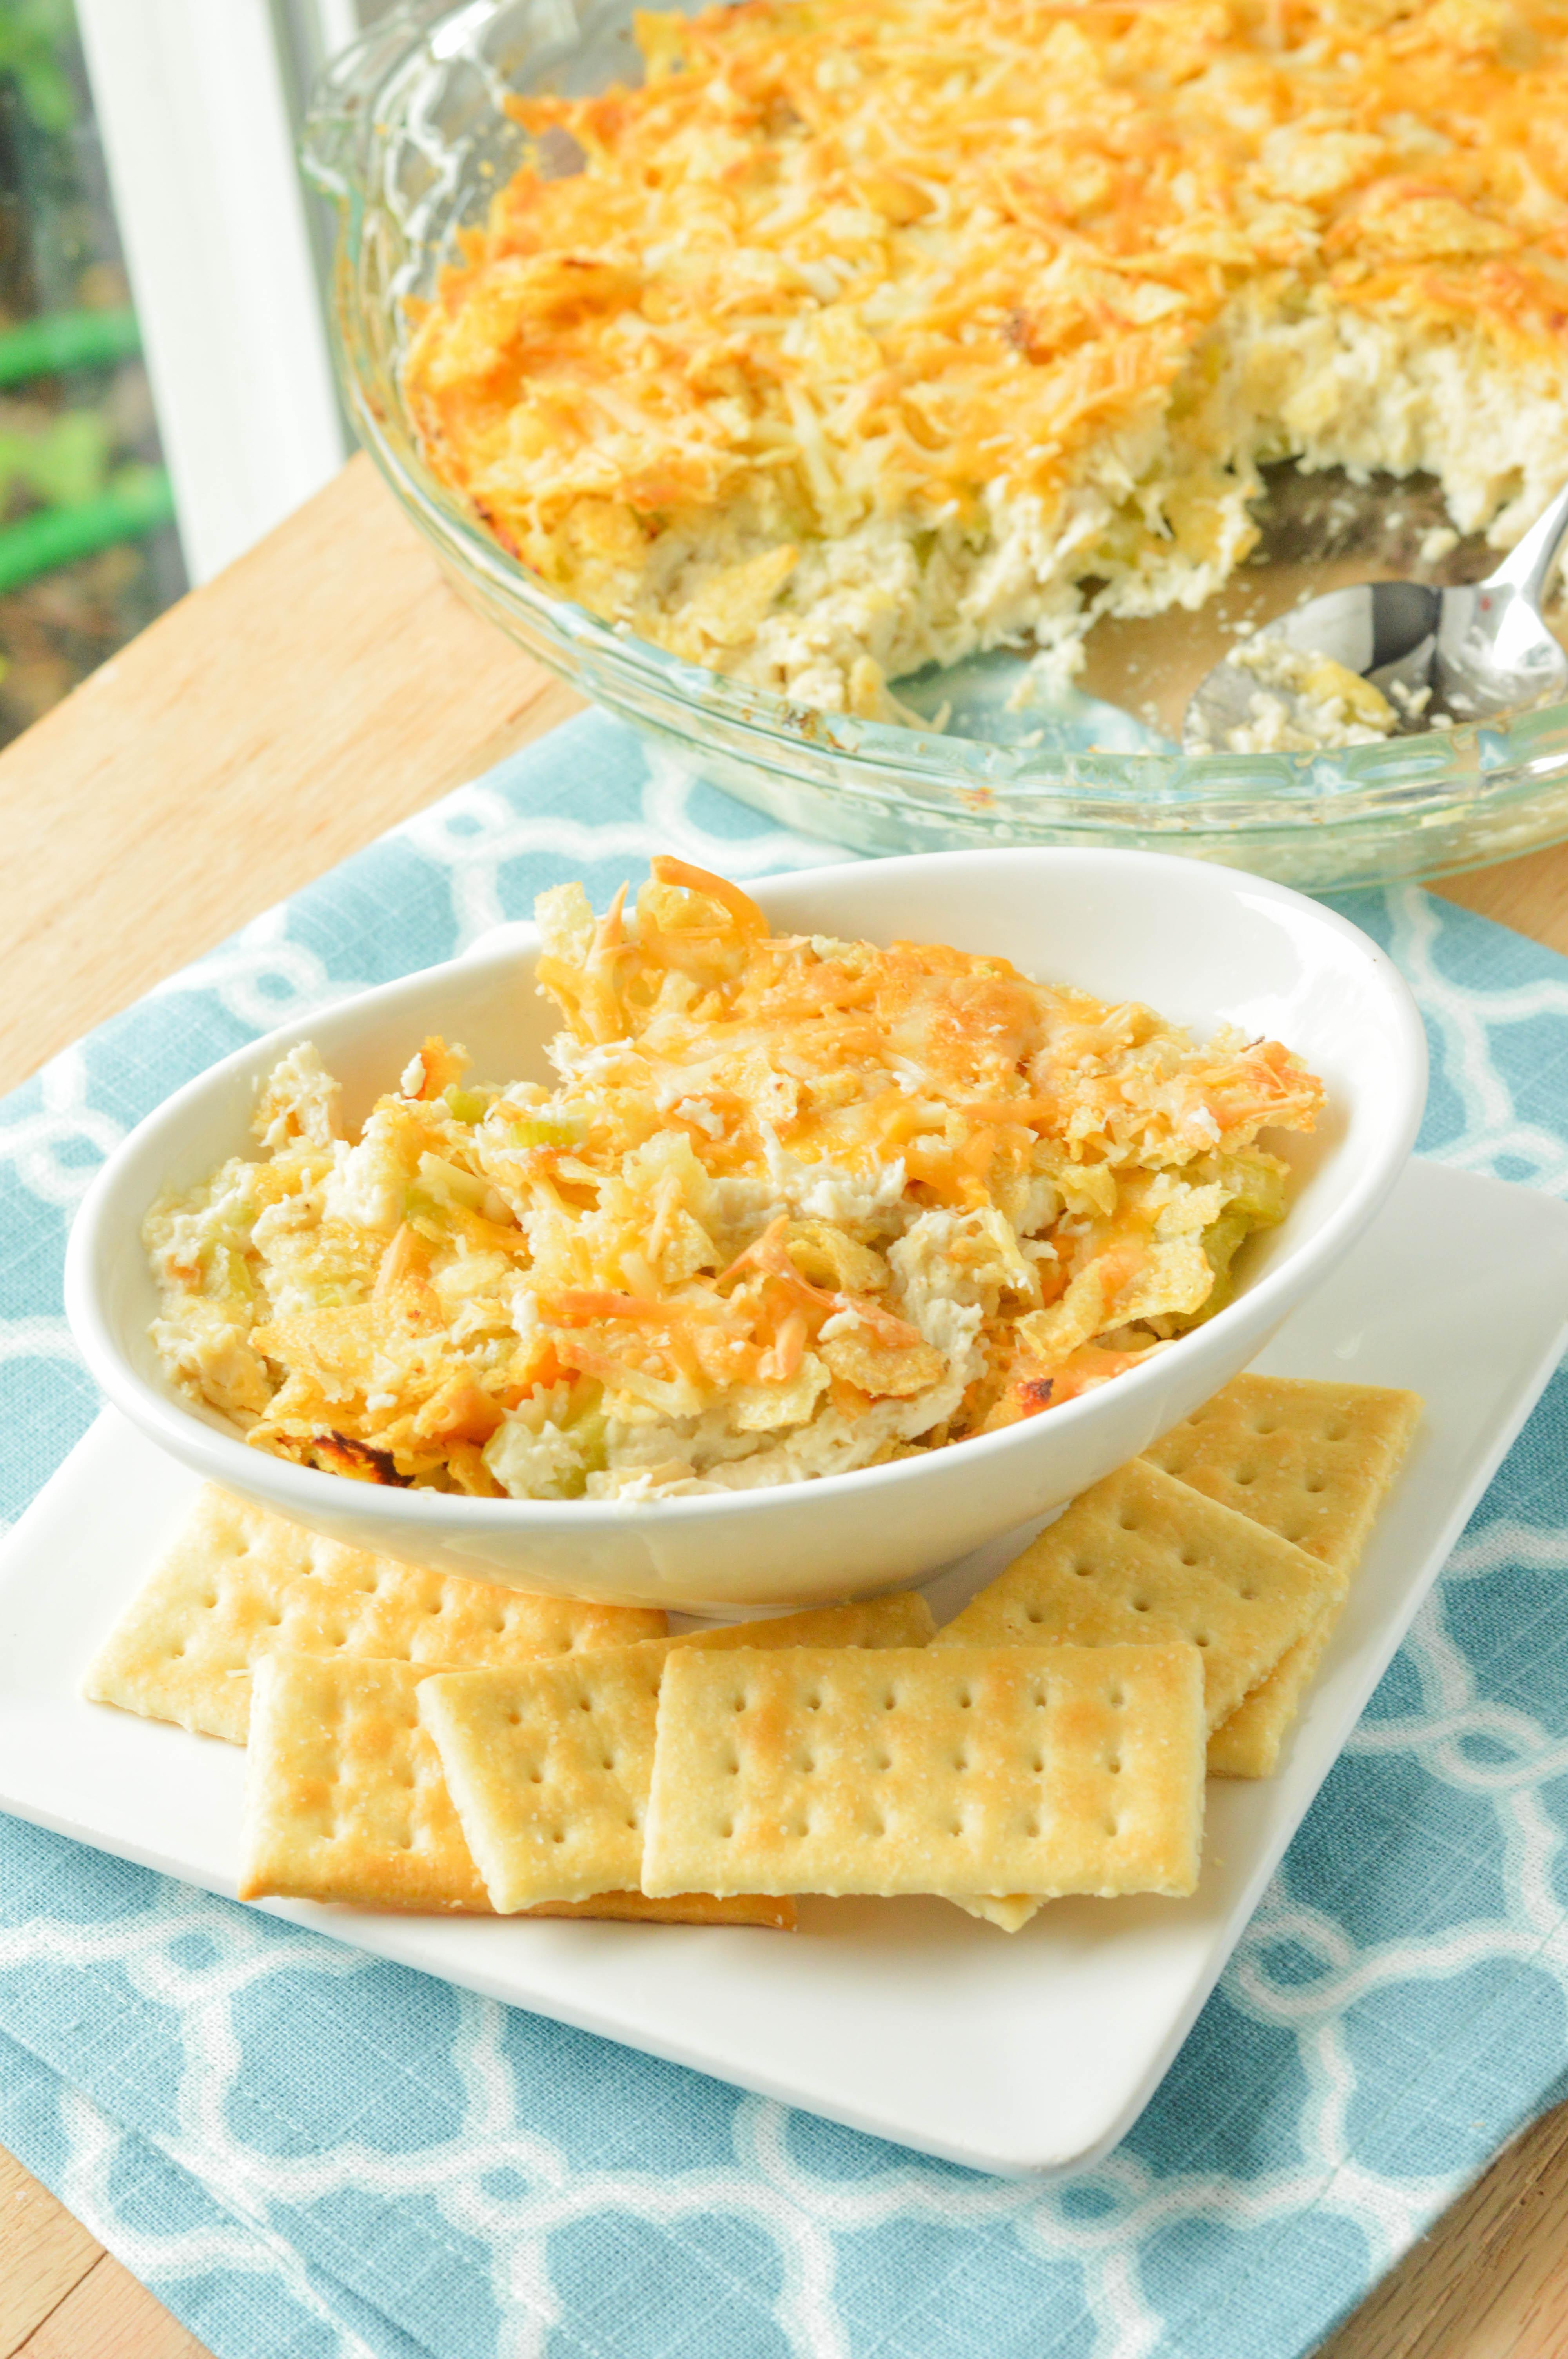 Hot Chicken Salad Casserole  Hot Chicken Salad Casserole Macaroni and Cheesecake